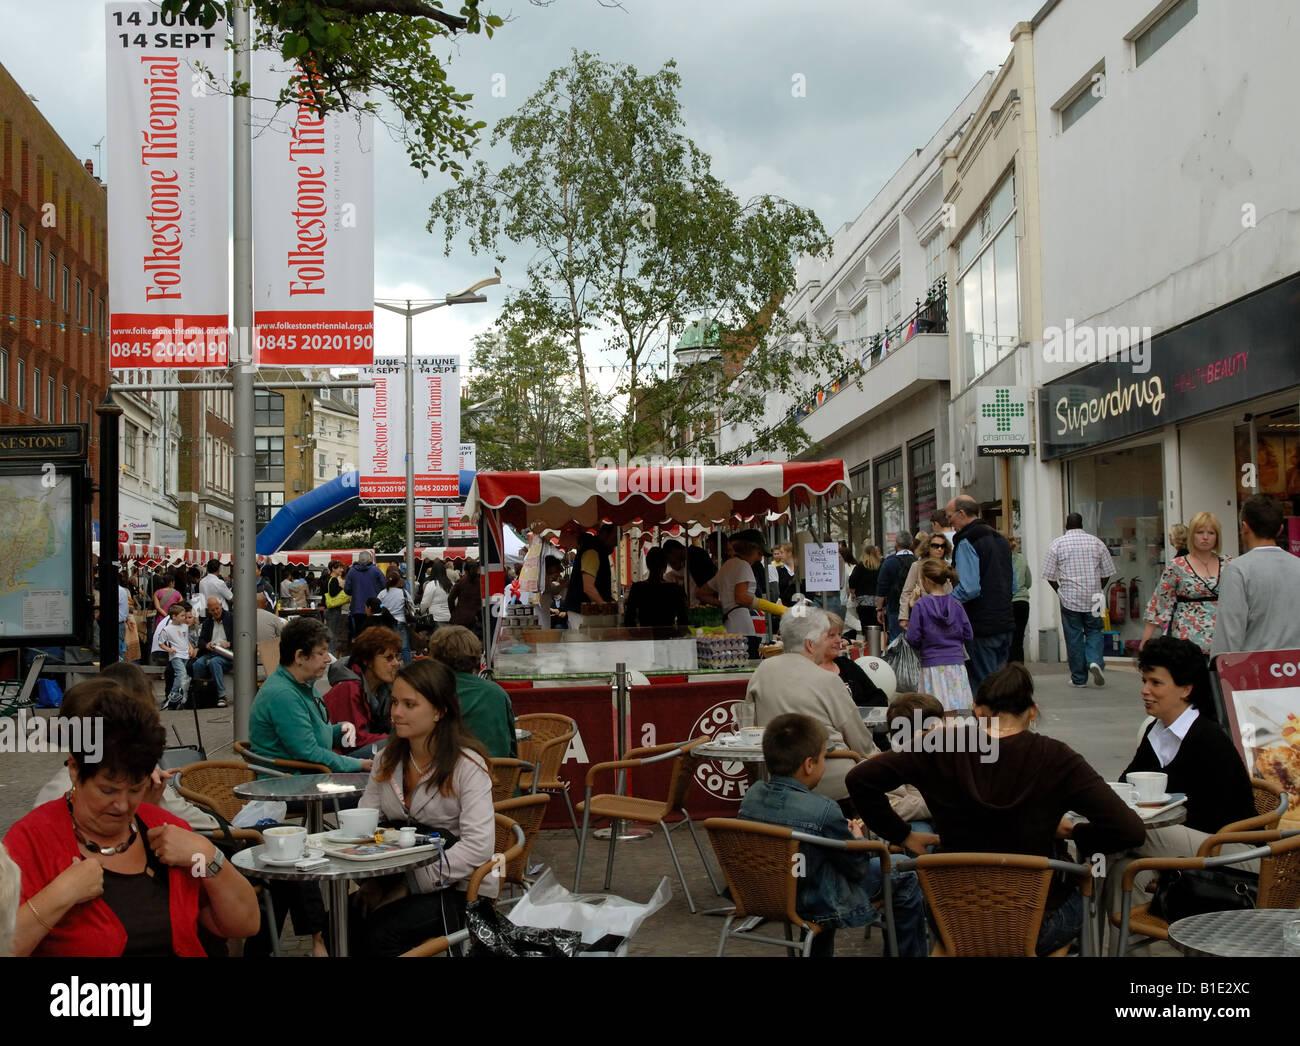 Folkestone town centre during the Folkestone Triennial arts festival - Stock Image